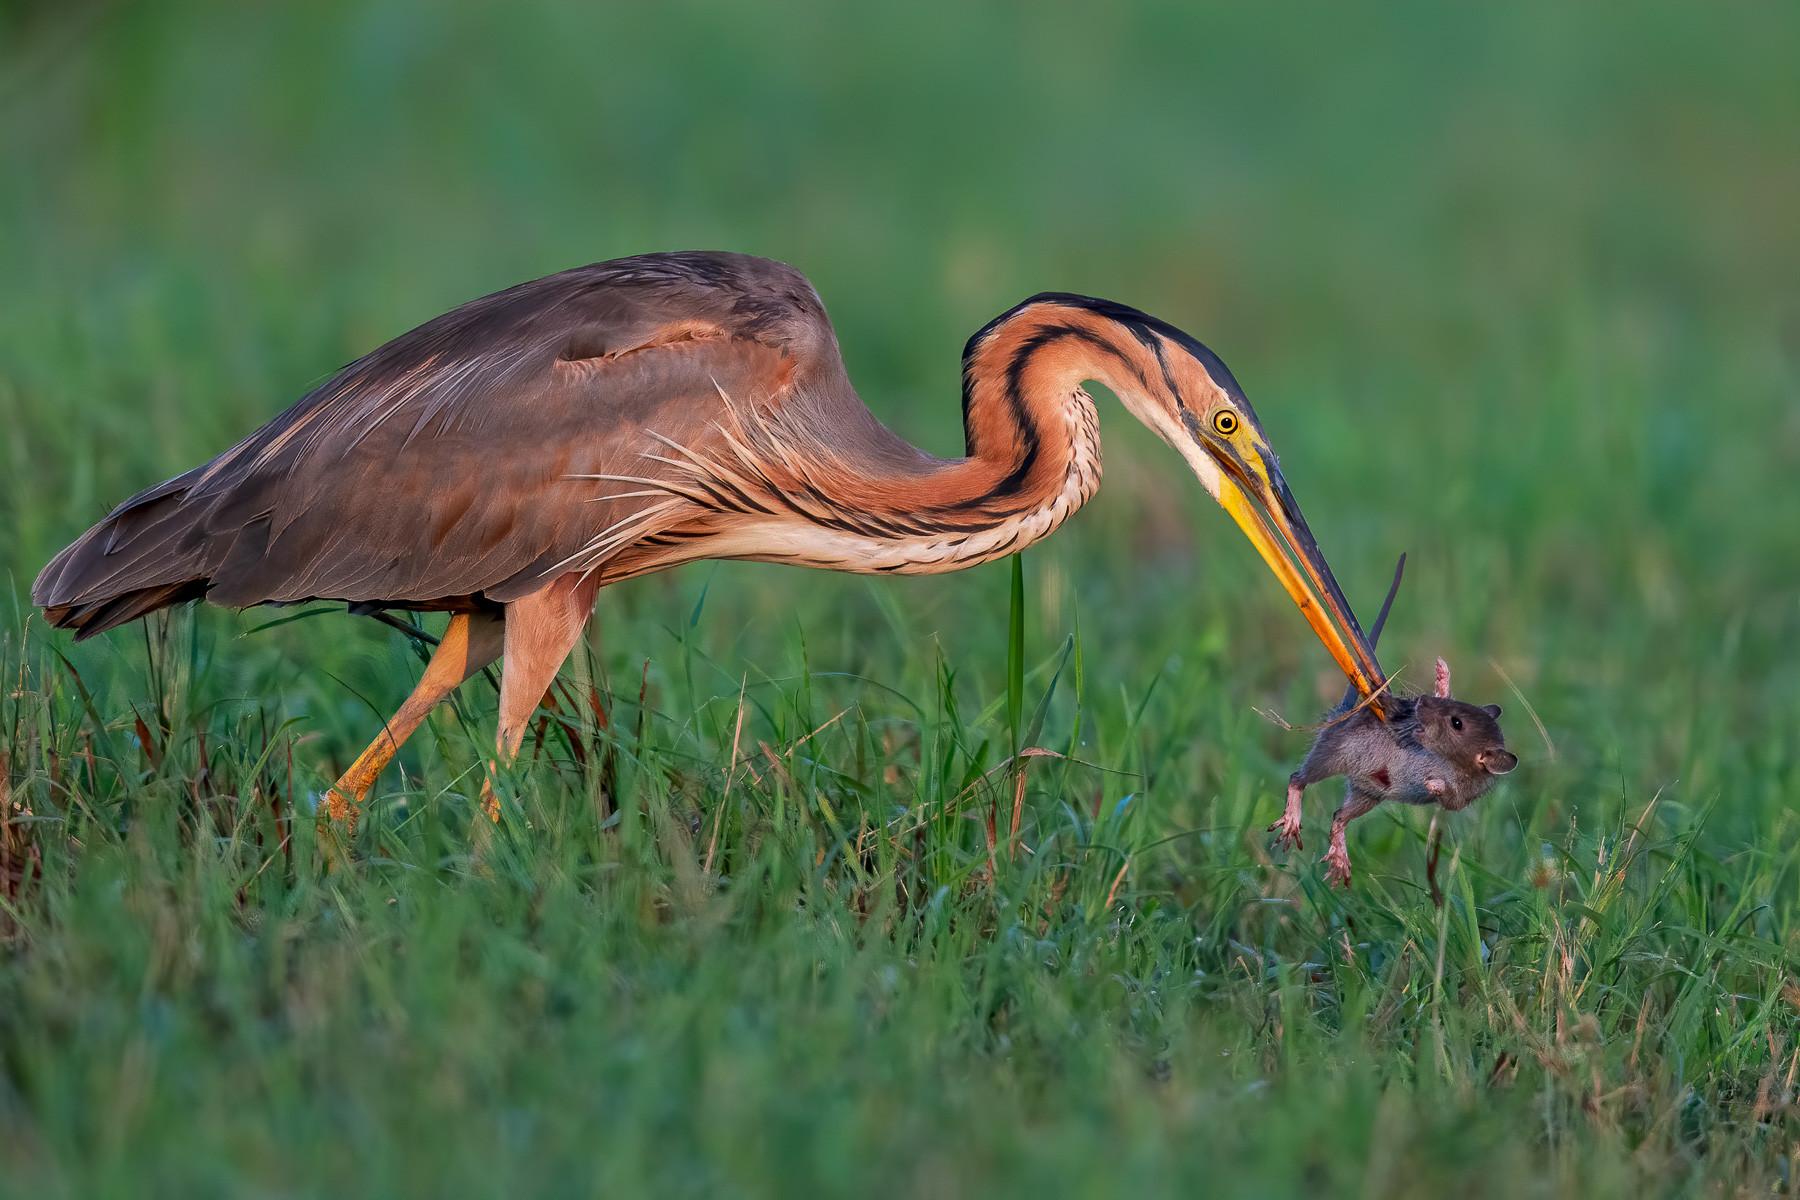 Silver winner: Bird Behavior